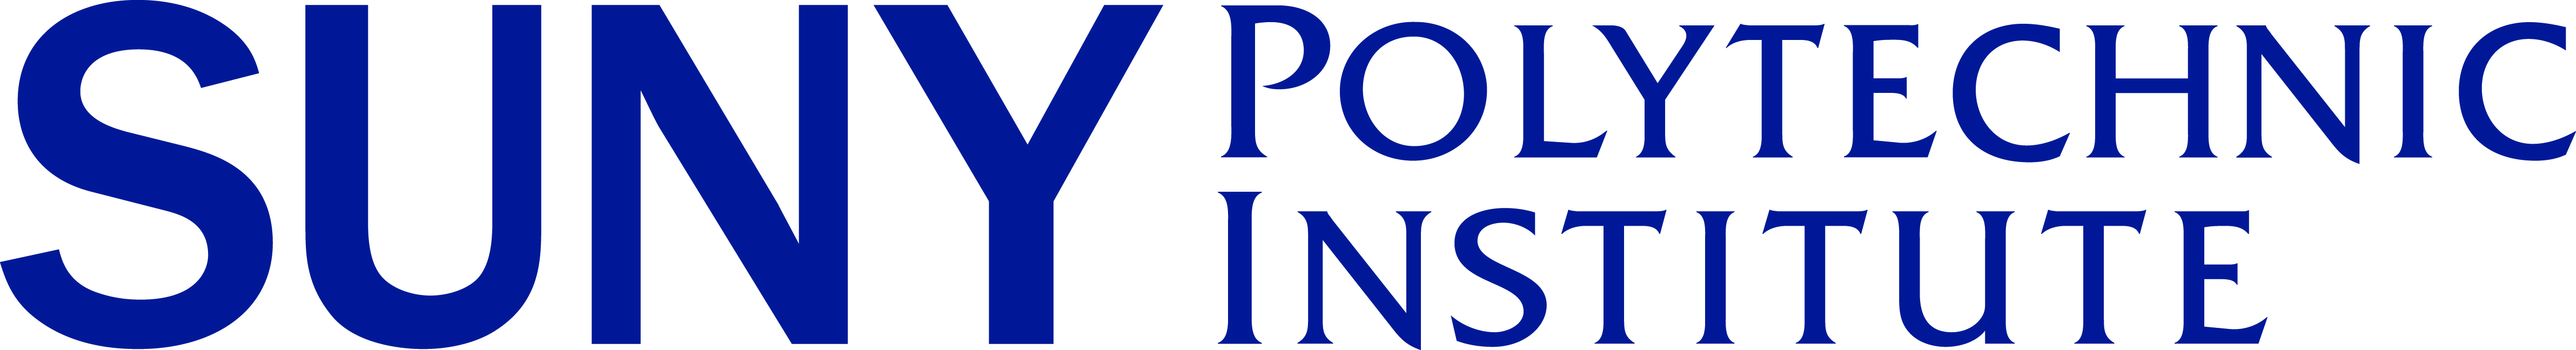 SUNY Polytechnic